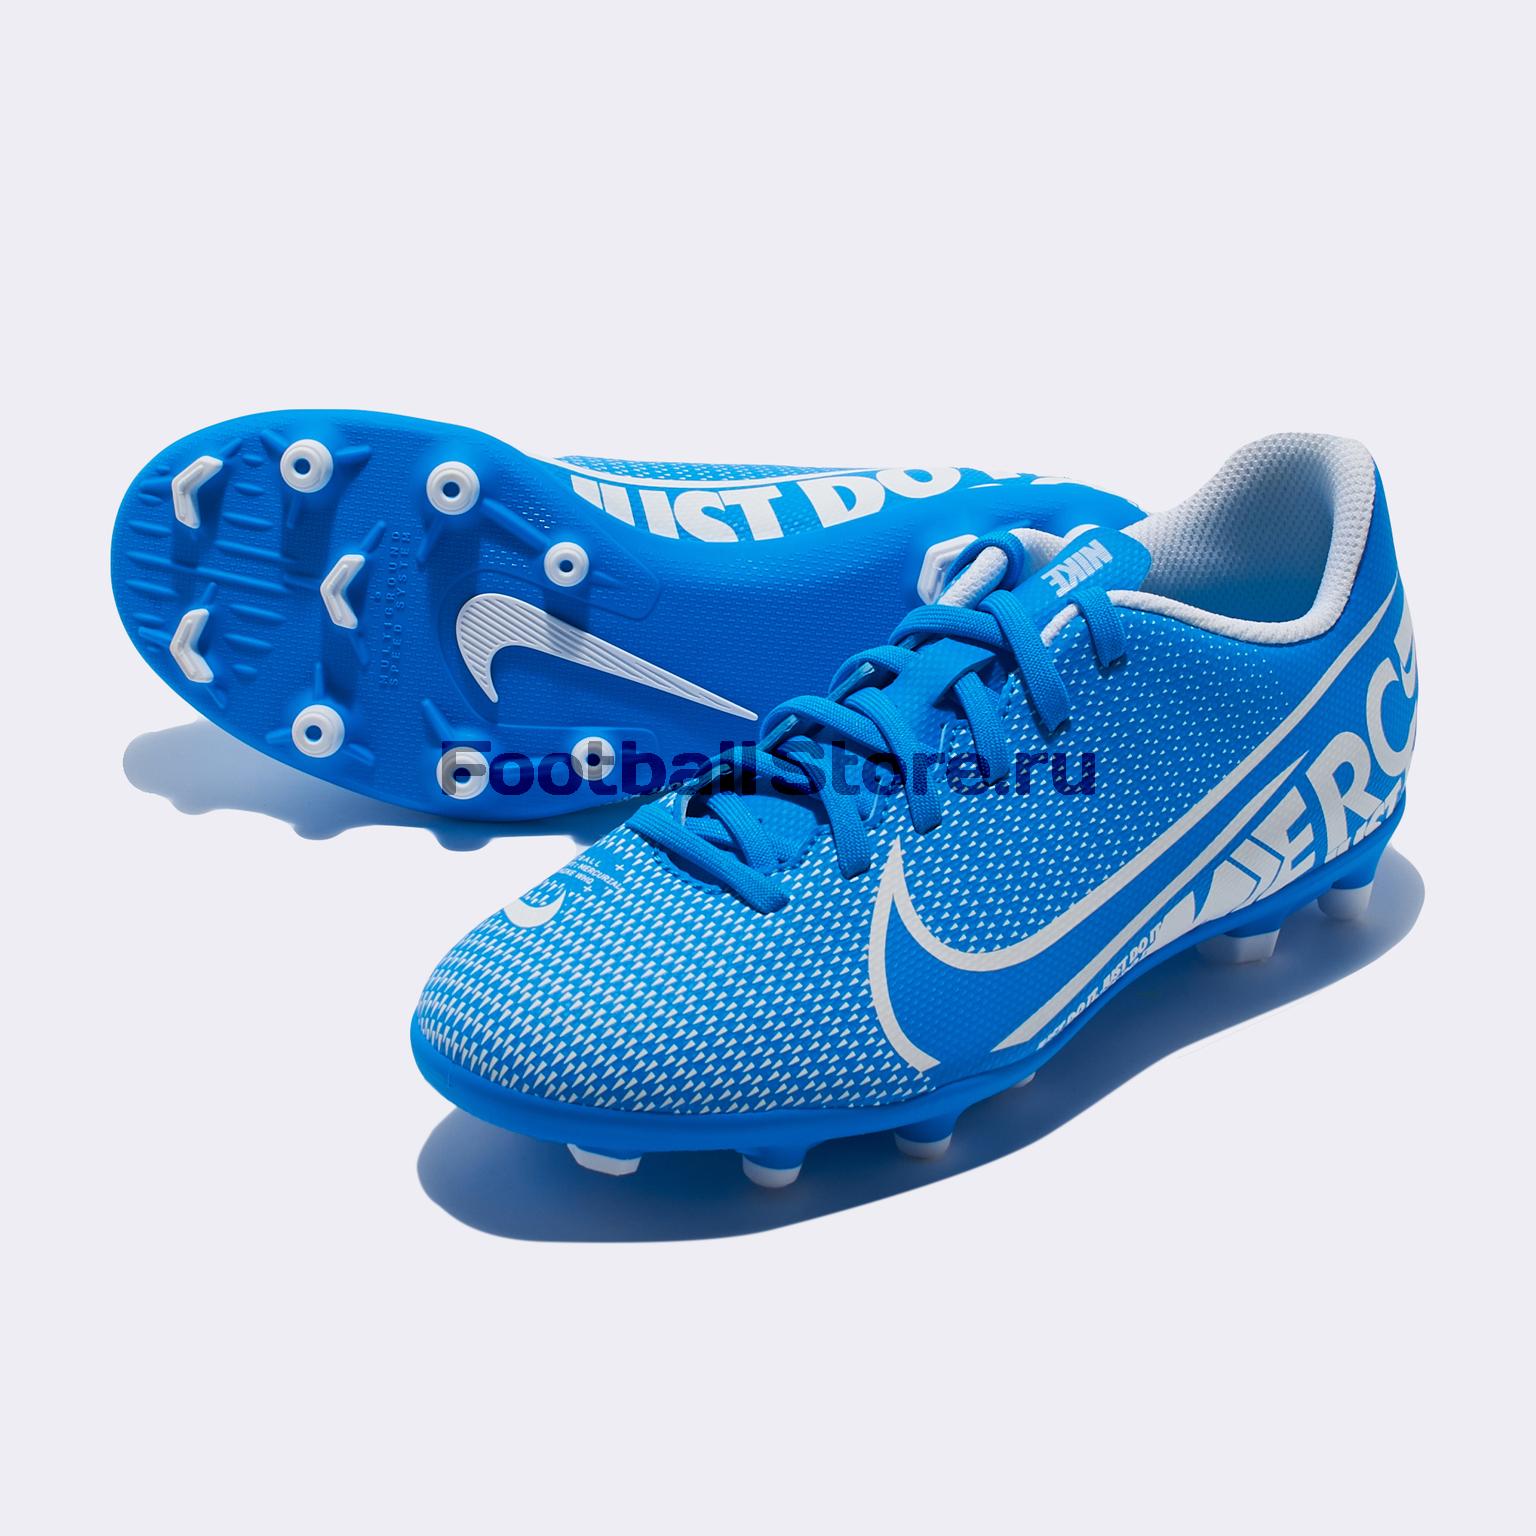 Бутсы детские Nike Vapor 13 Club FG/MG AT8161-414 nike бутсы мужские nike neymar vapor 12 club mg размер 44